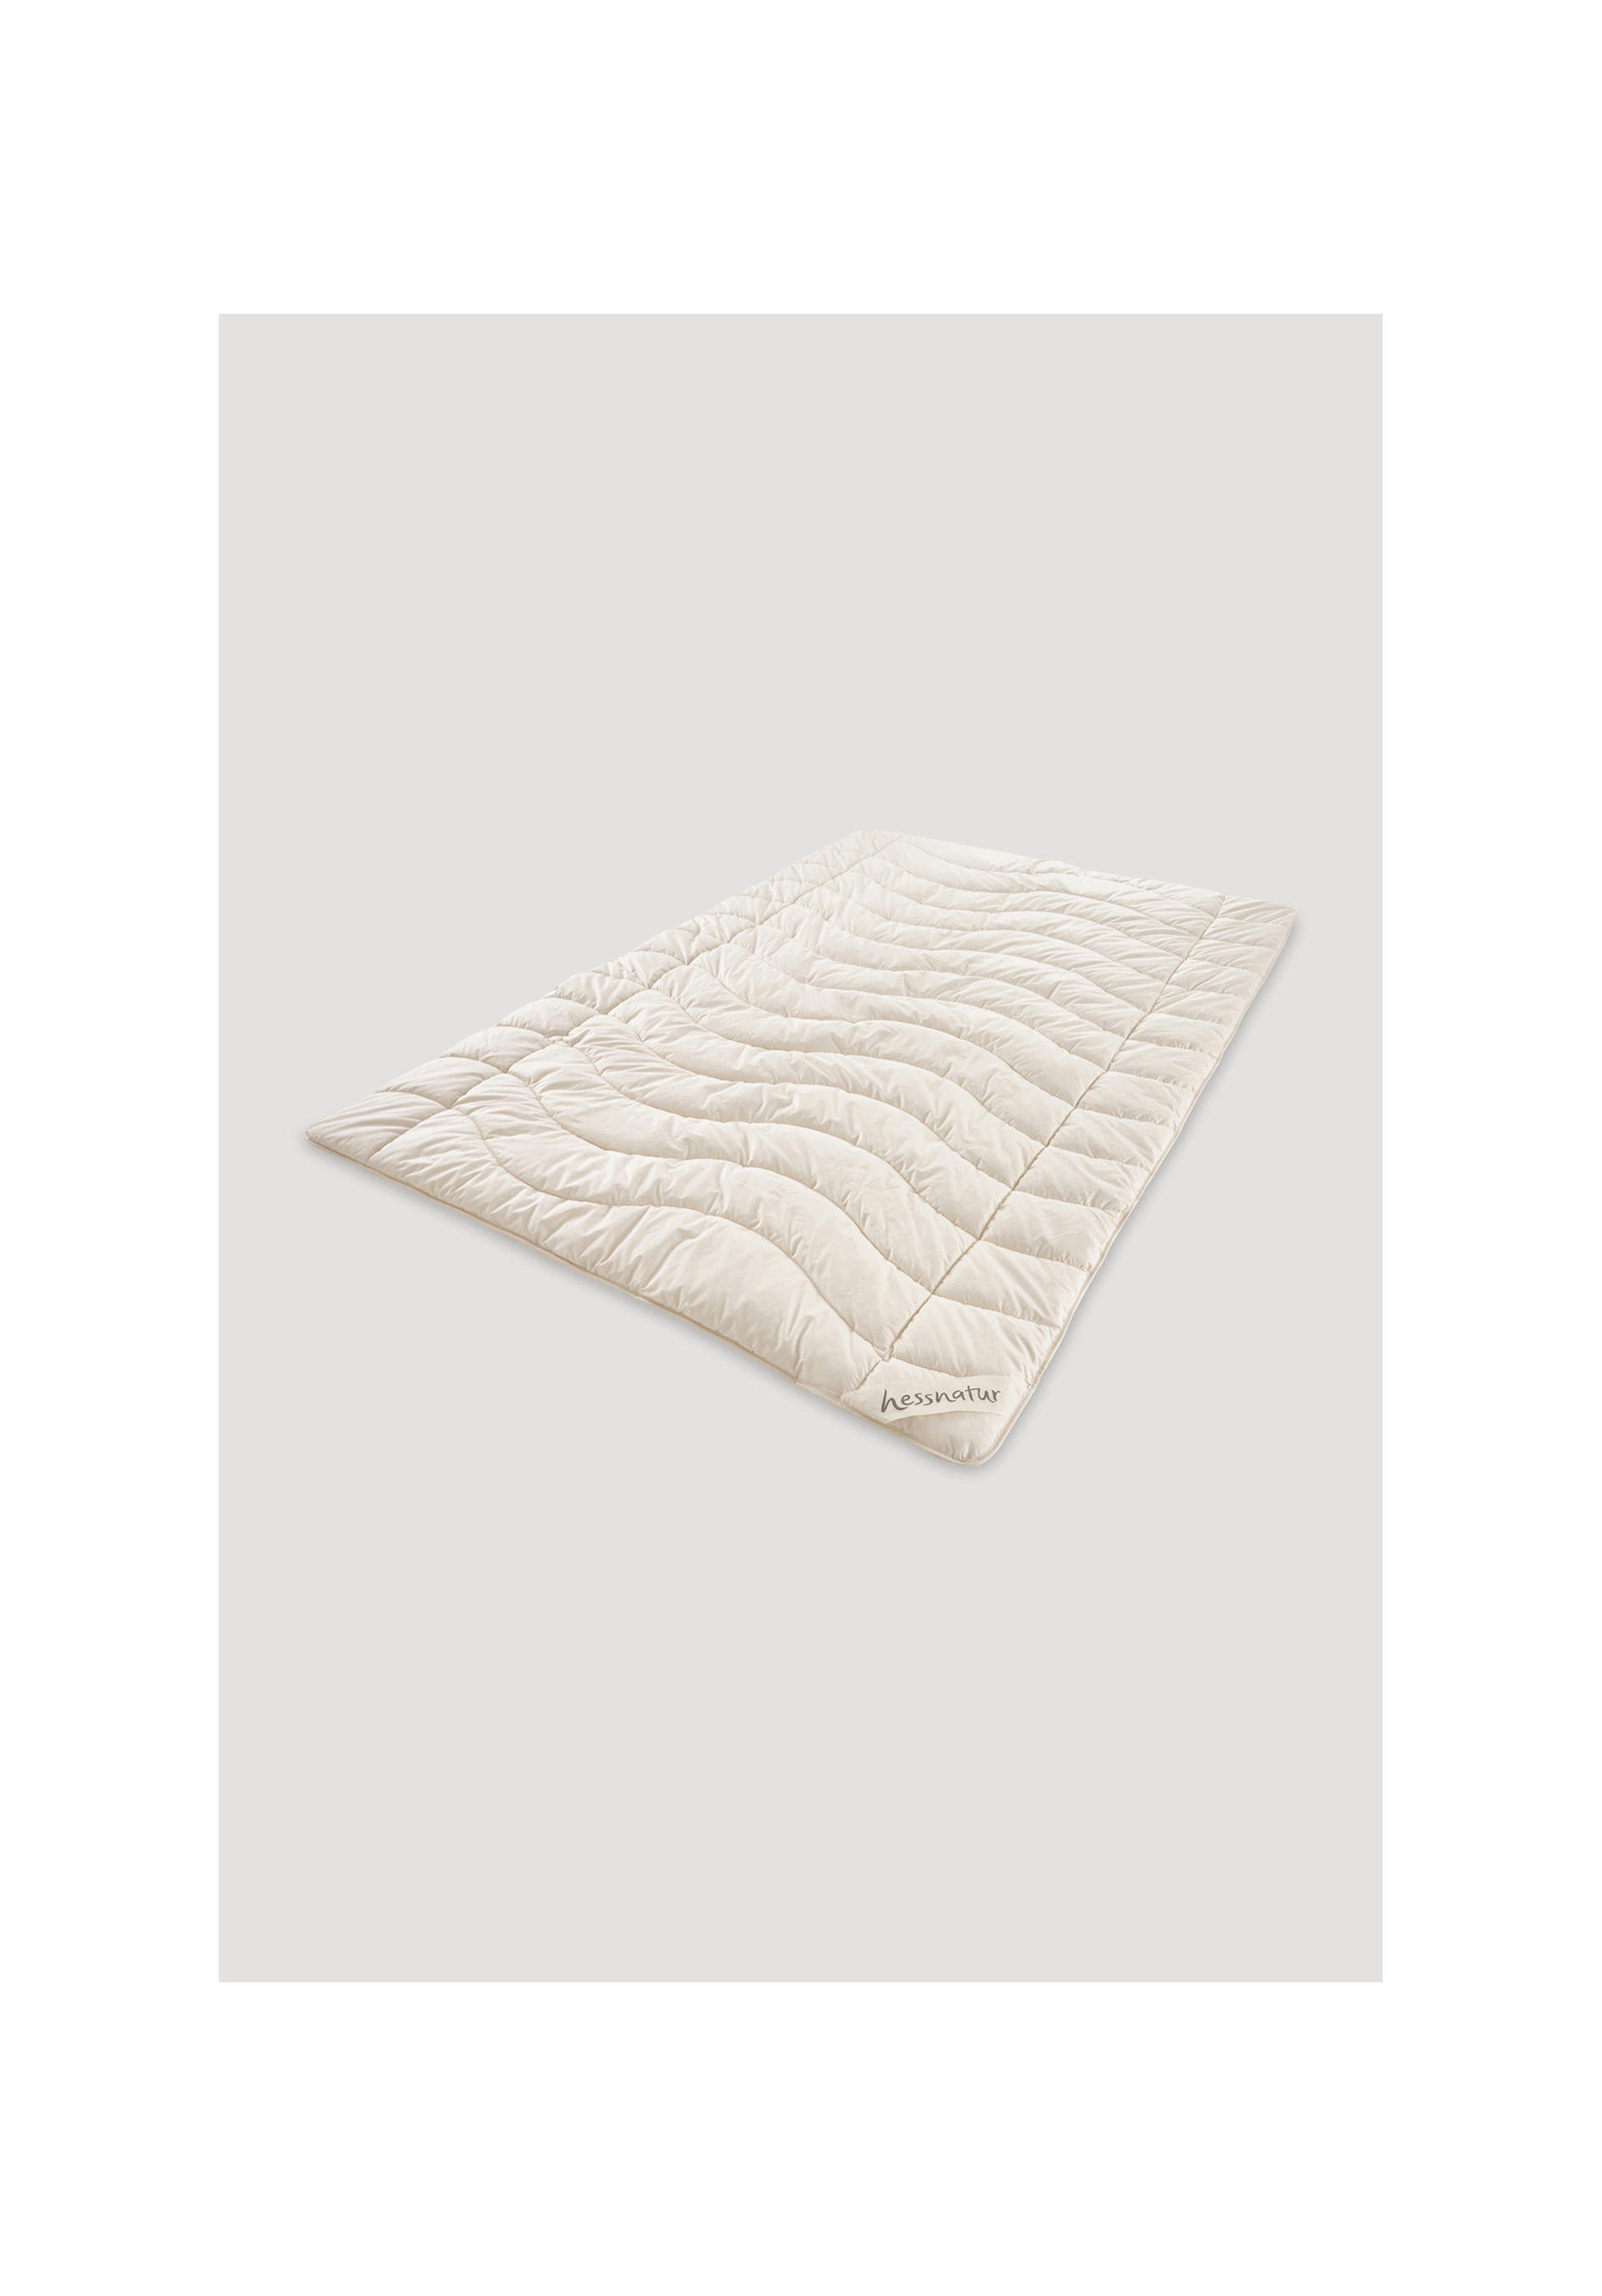 wolldecke aus baumwolle top elvang horizon x cm with wolldecke aus baumwolle interesting. Black Bedroom Furniture Sets. Home Design Ideas